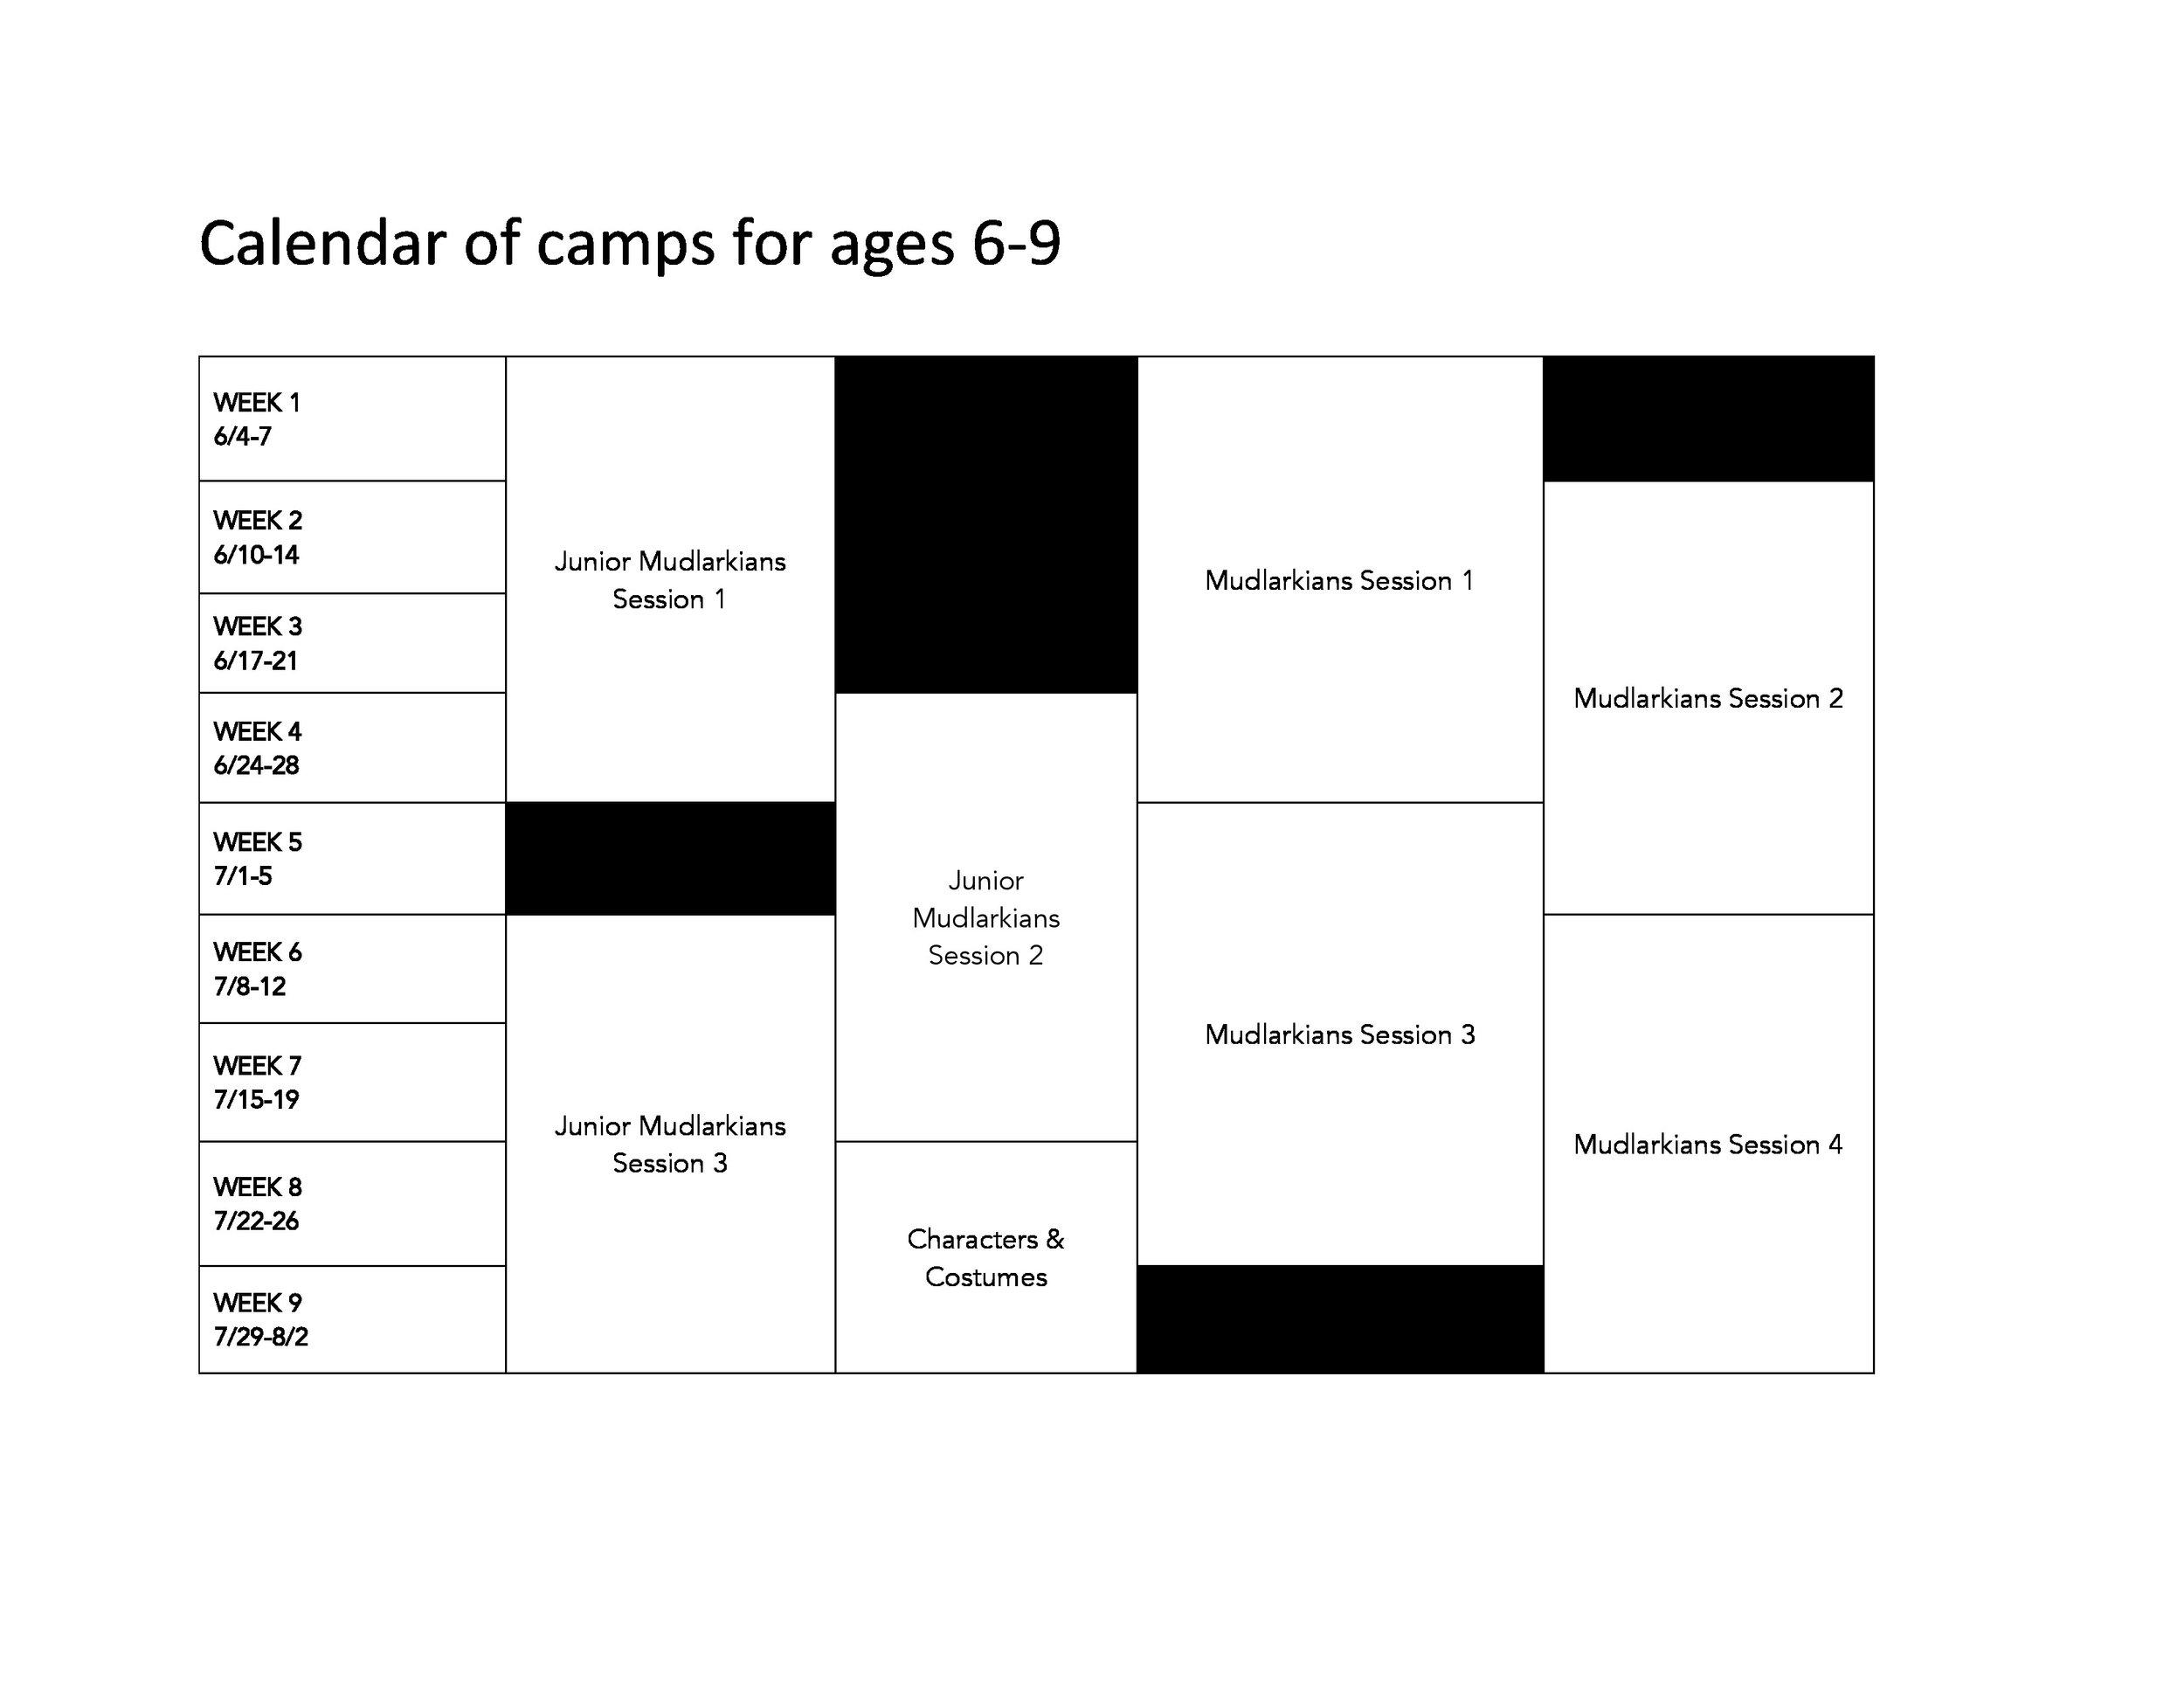 Calender of camps for 6-9_JPG.jpg